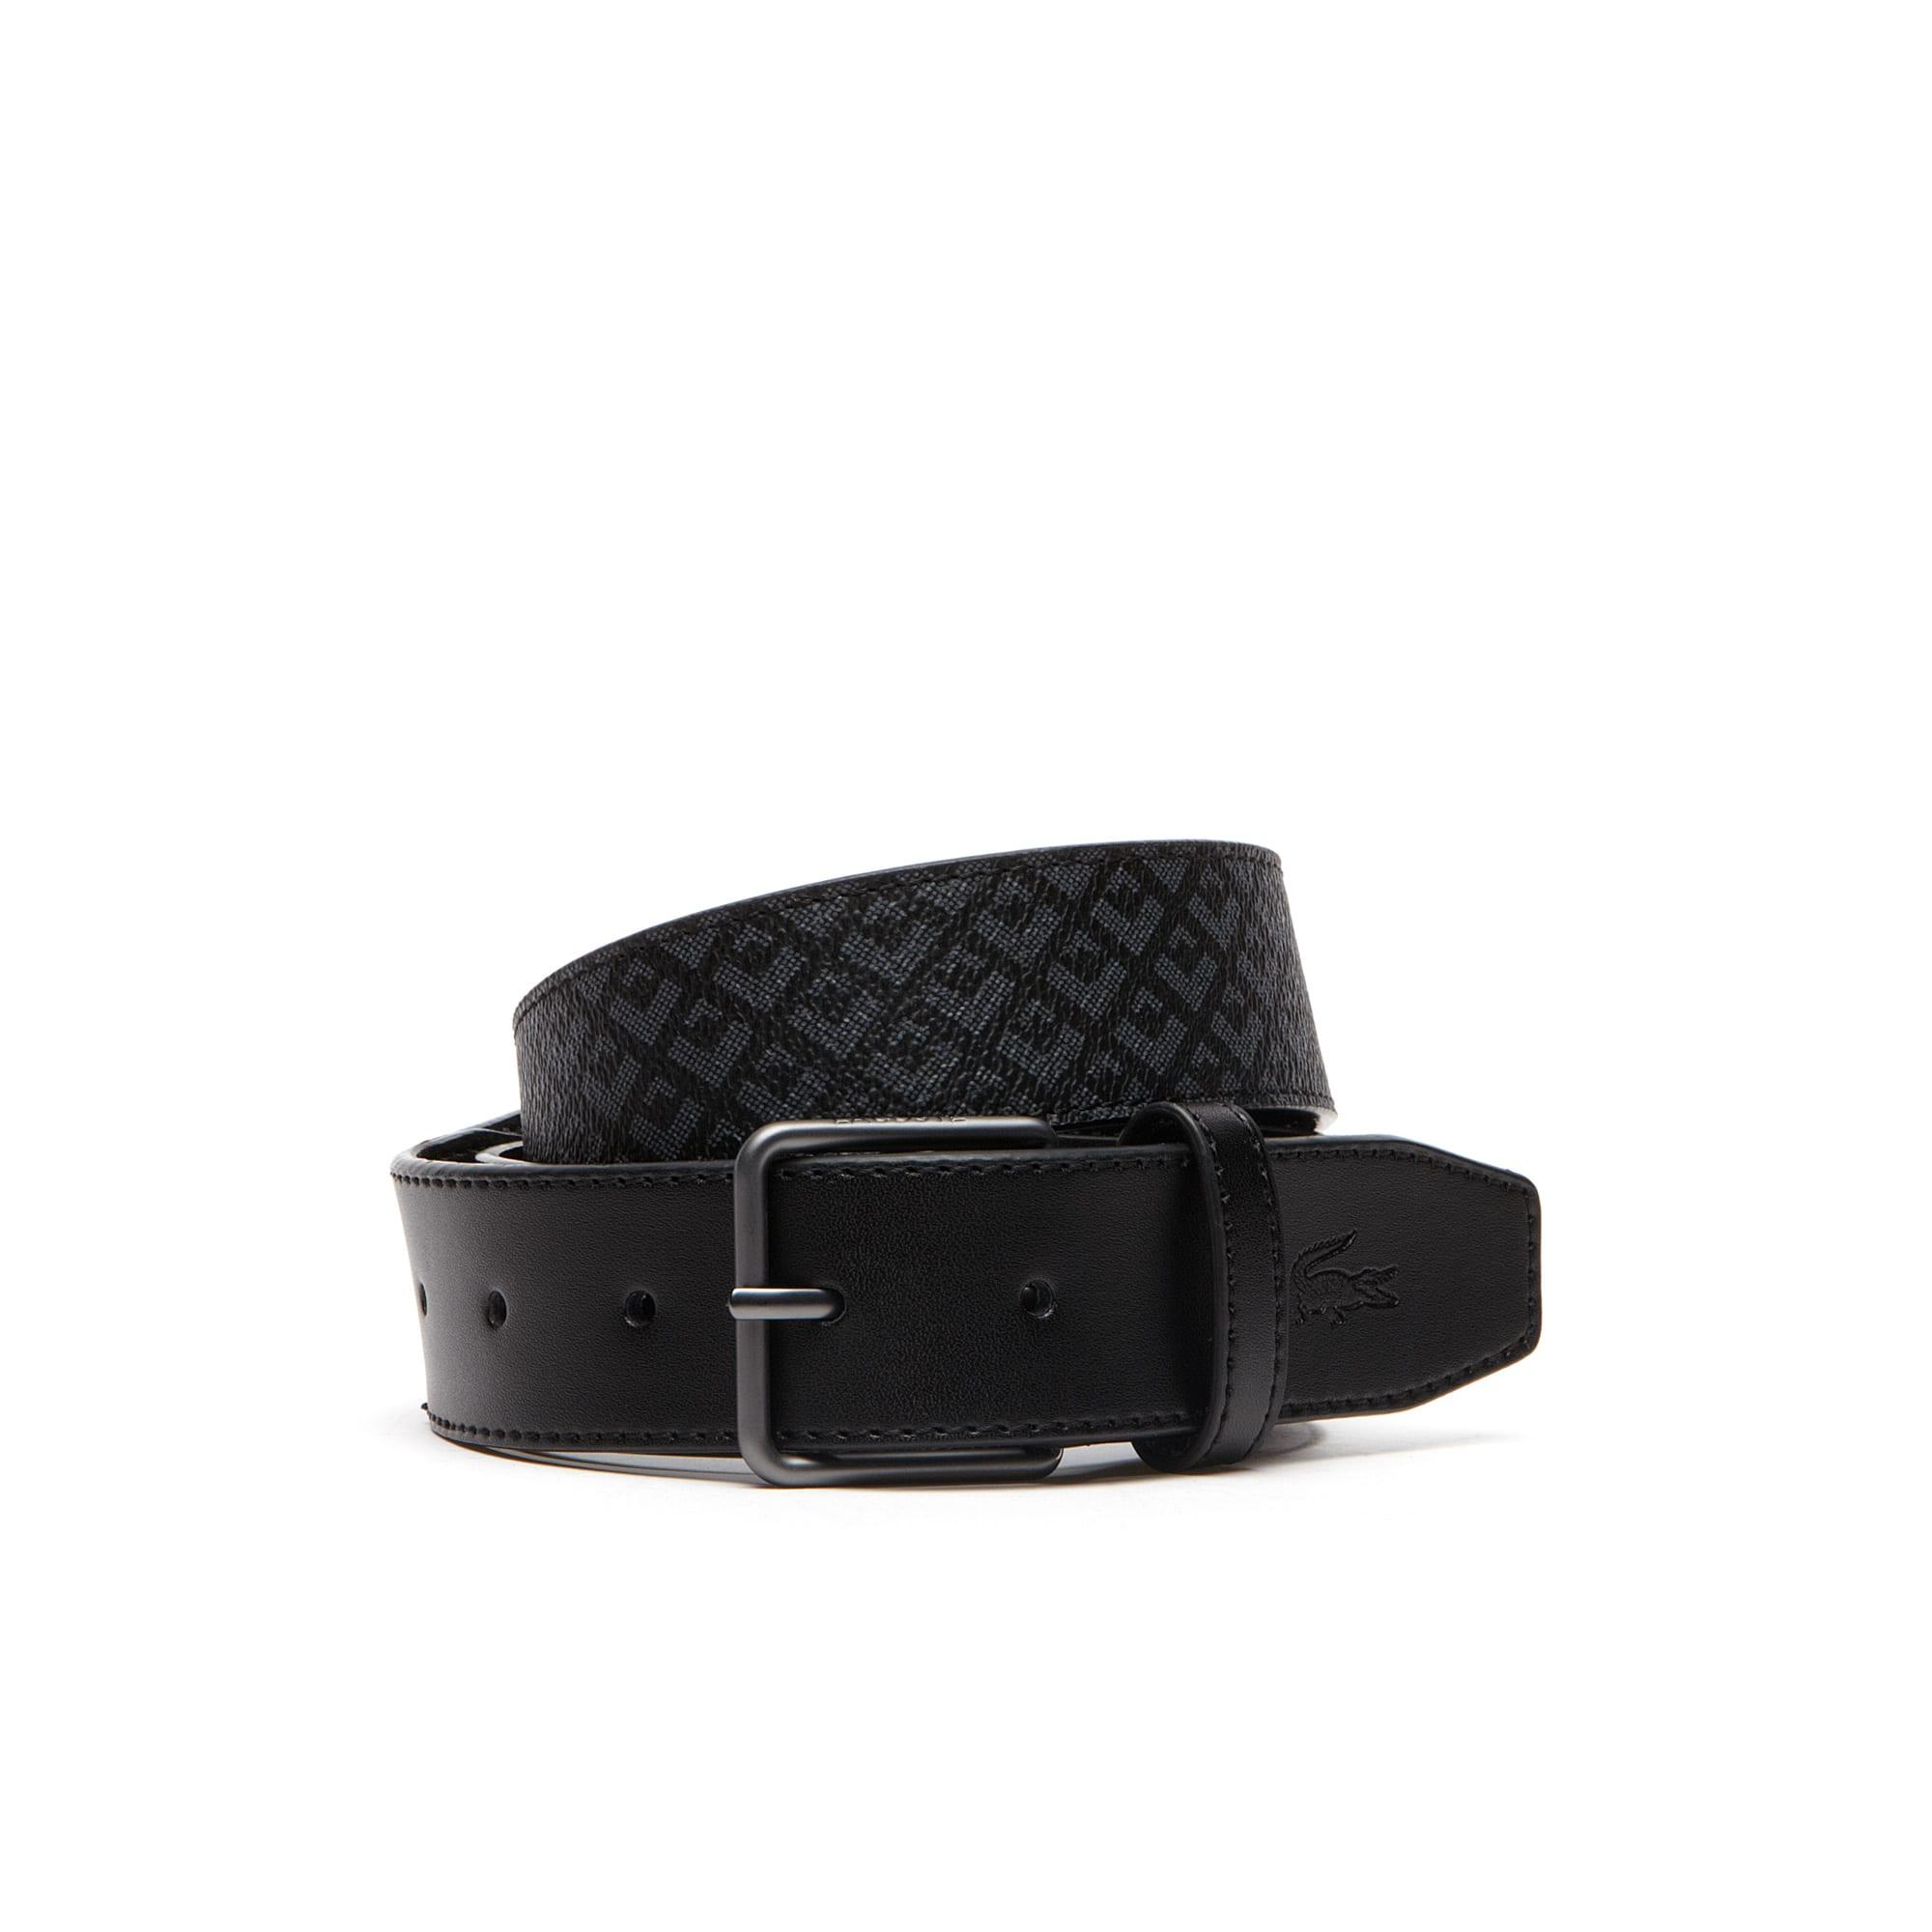 Edward Signature silk screened belt with leather tab